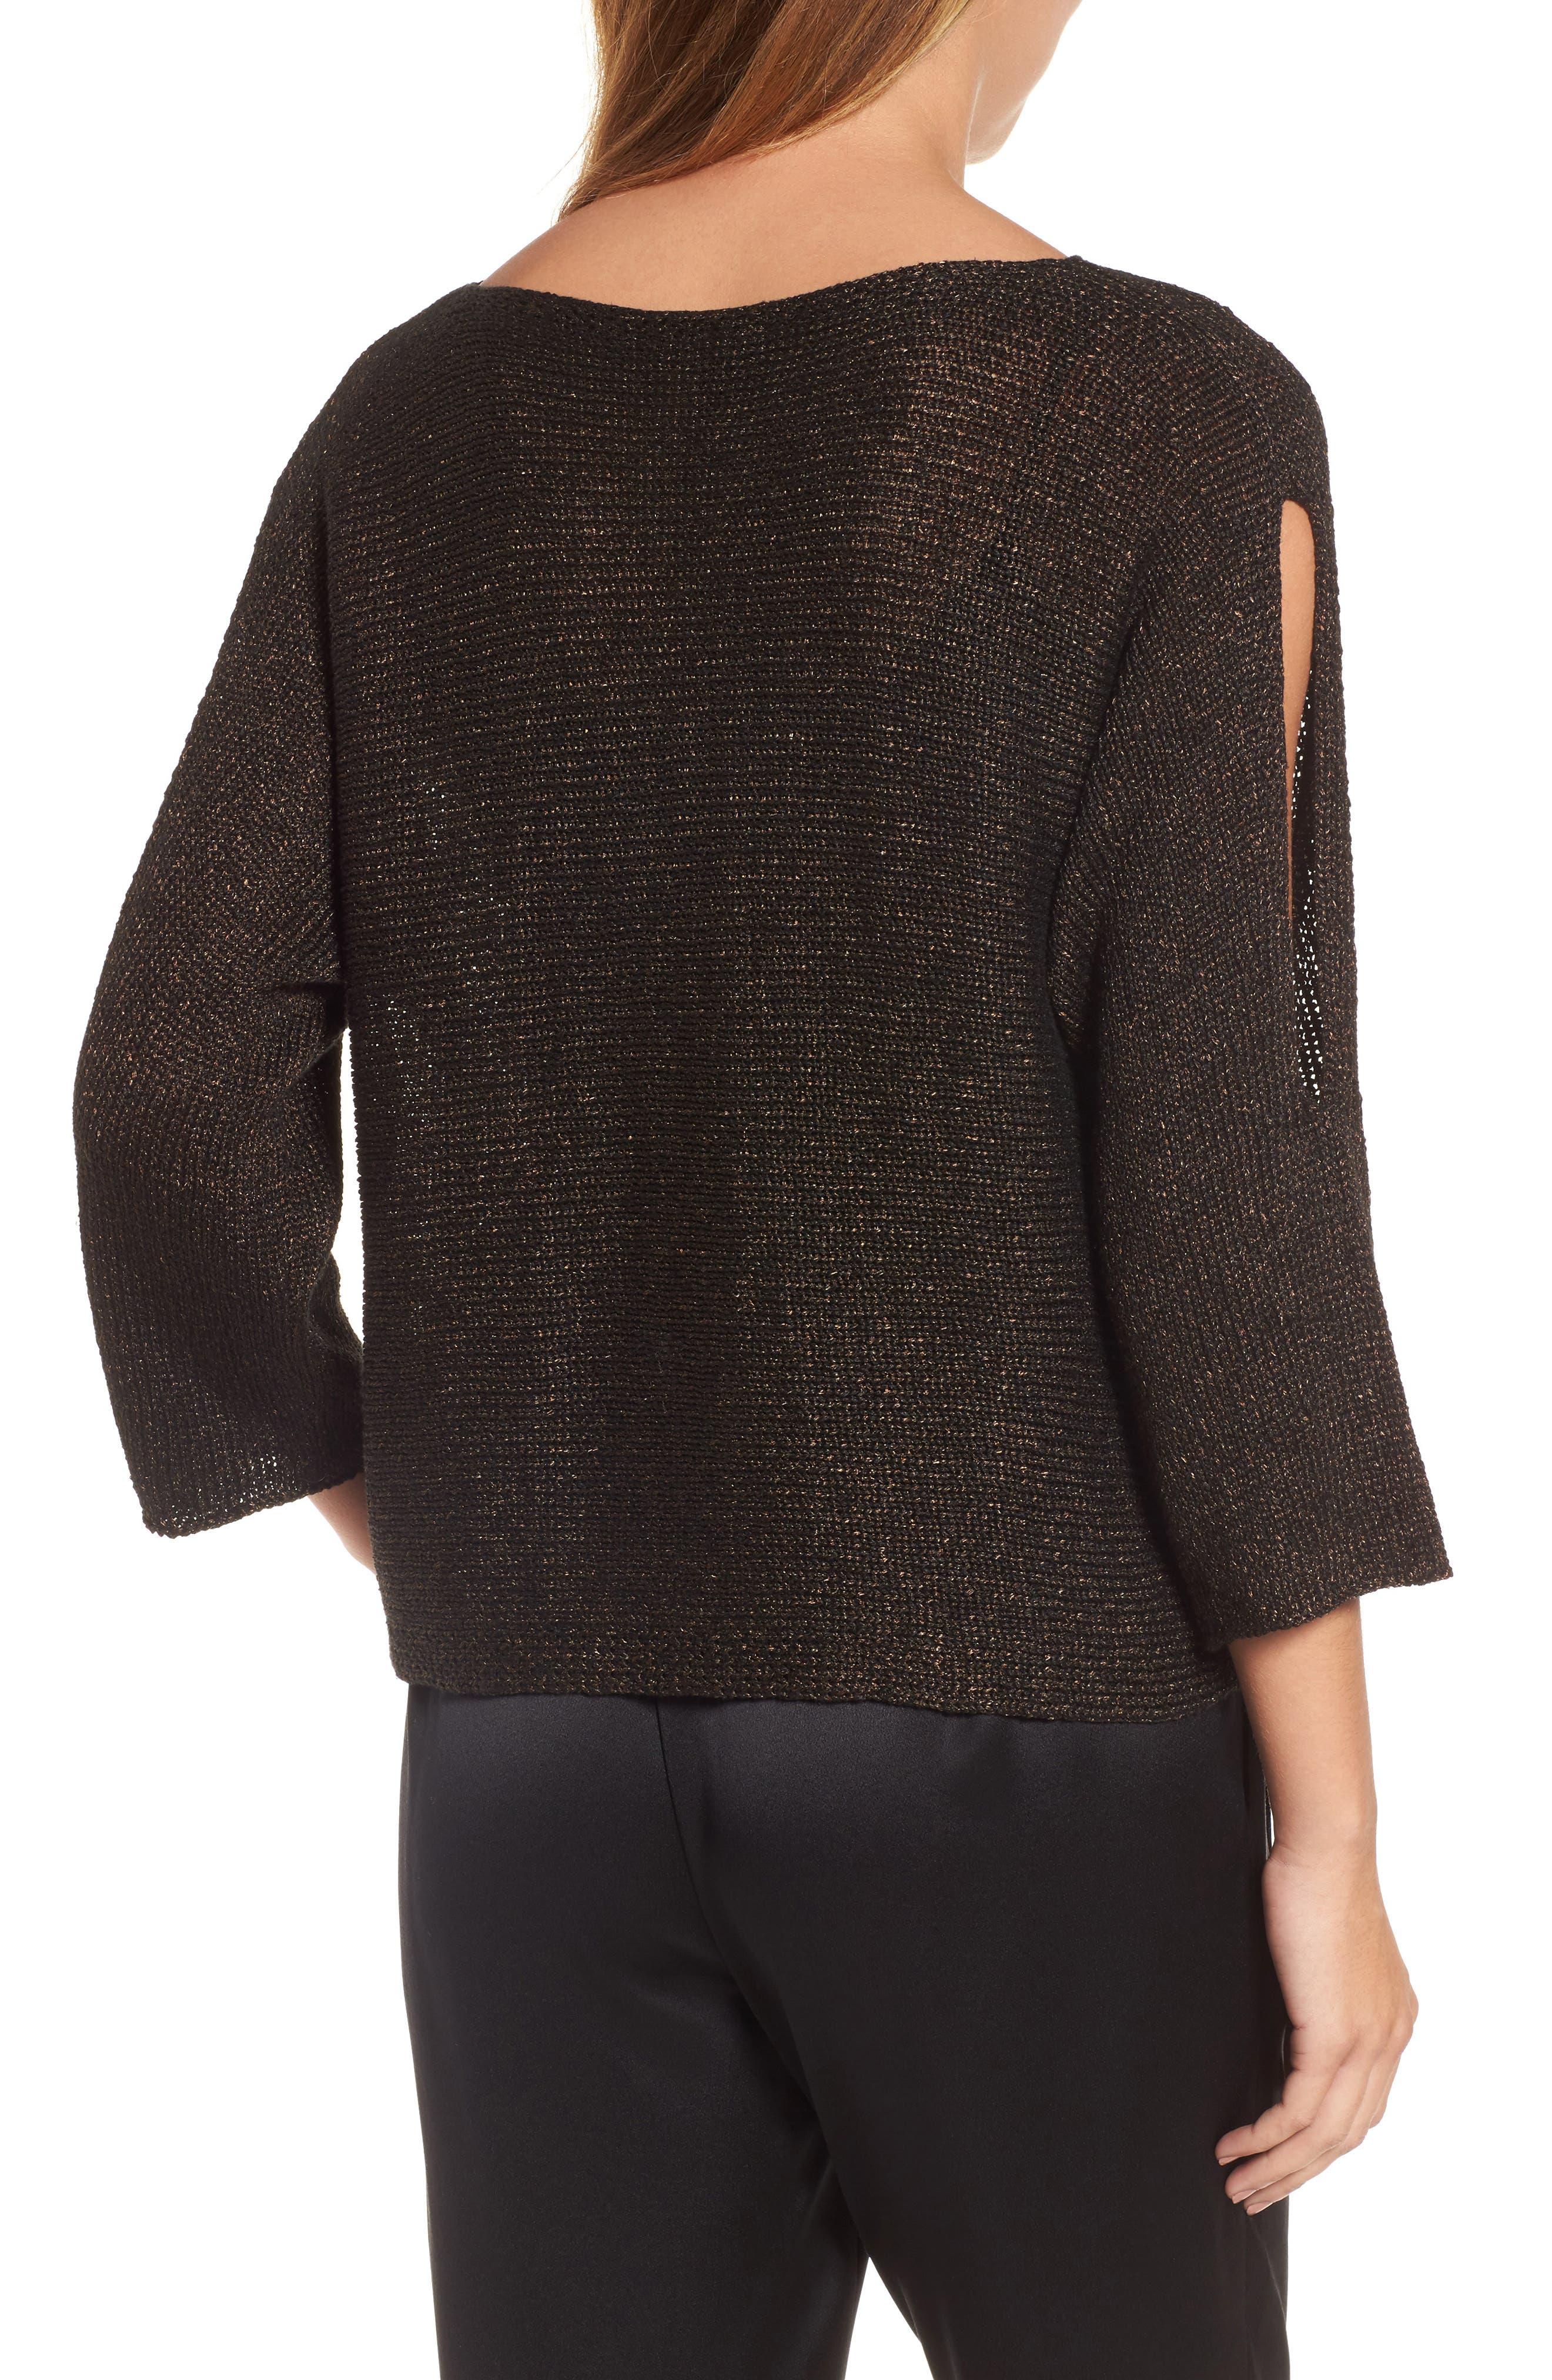 Alternate Image 2  - Eileen Fisher Metallic Organic Linen Blend Sweater (Regular & Petite)